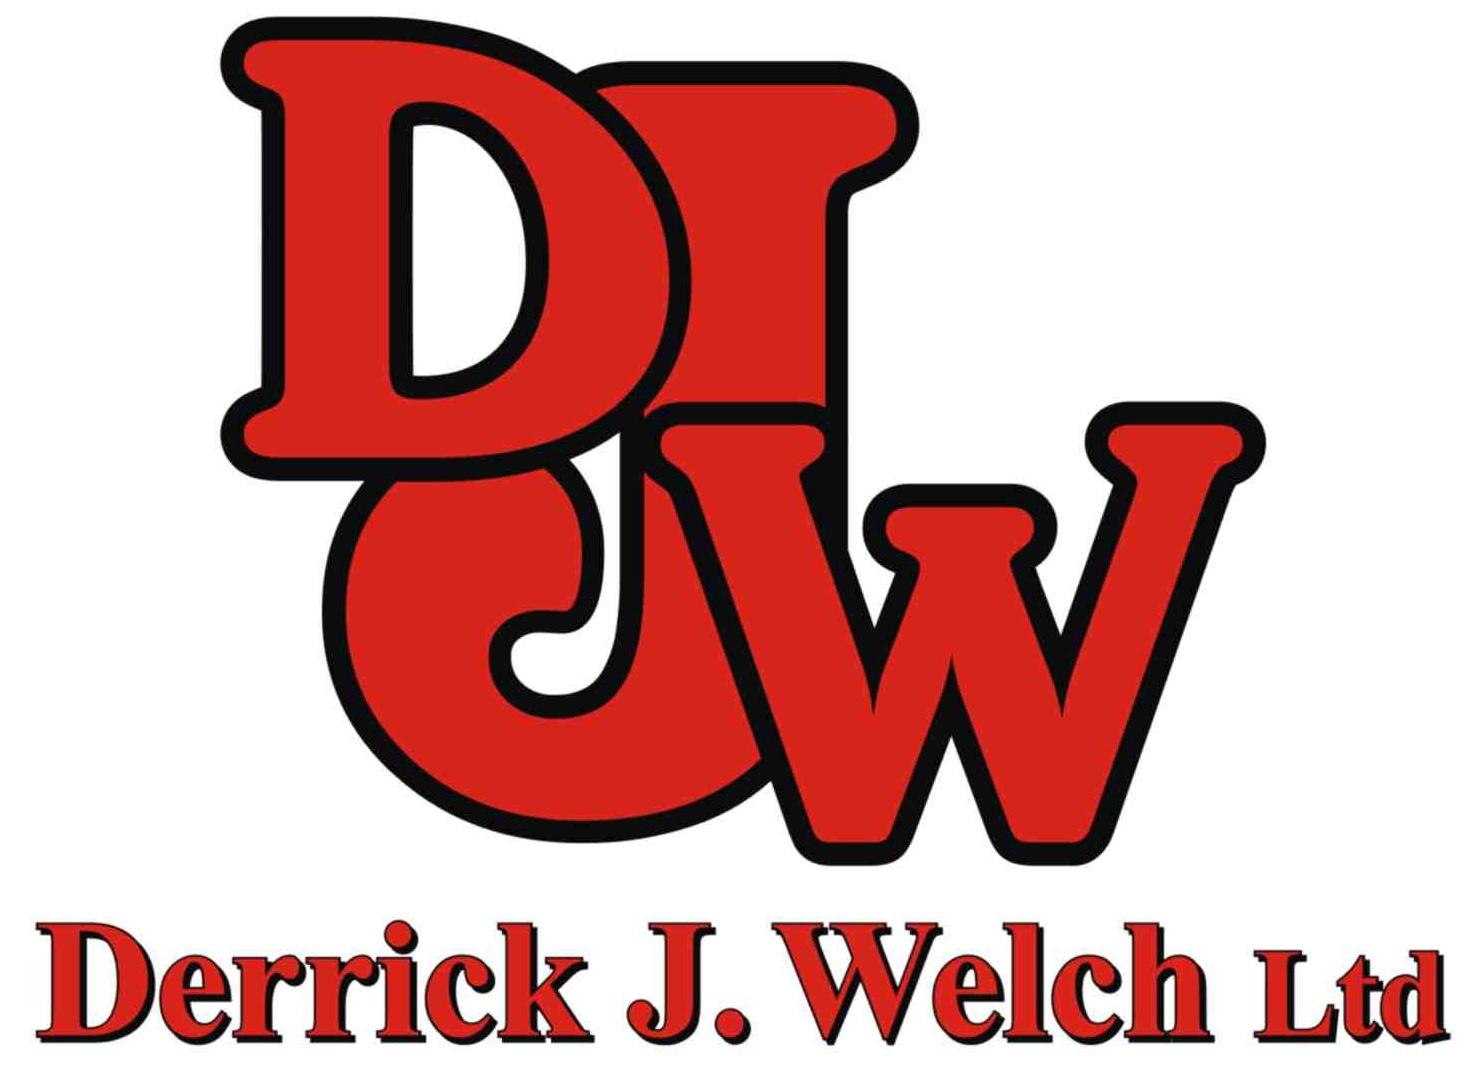 Derrick J Welch Ltd